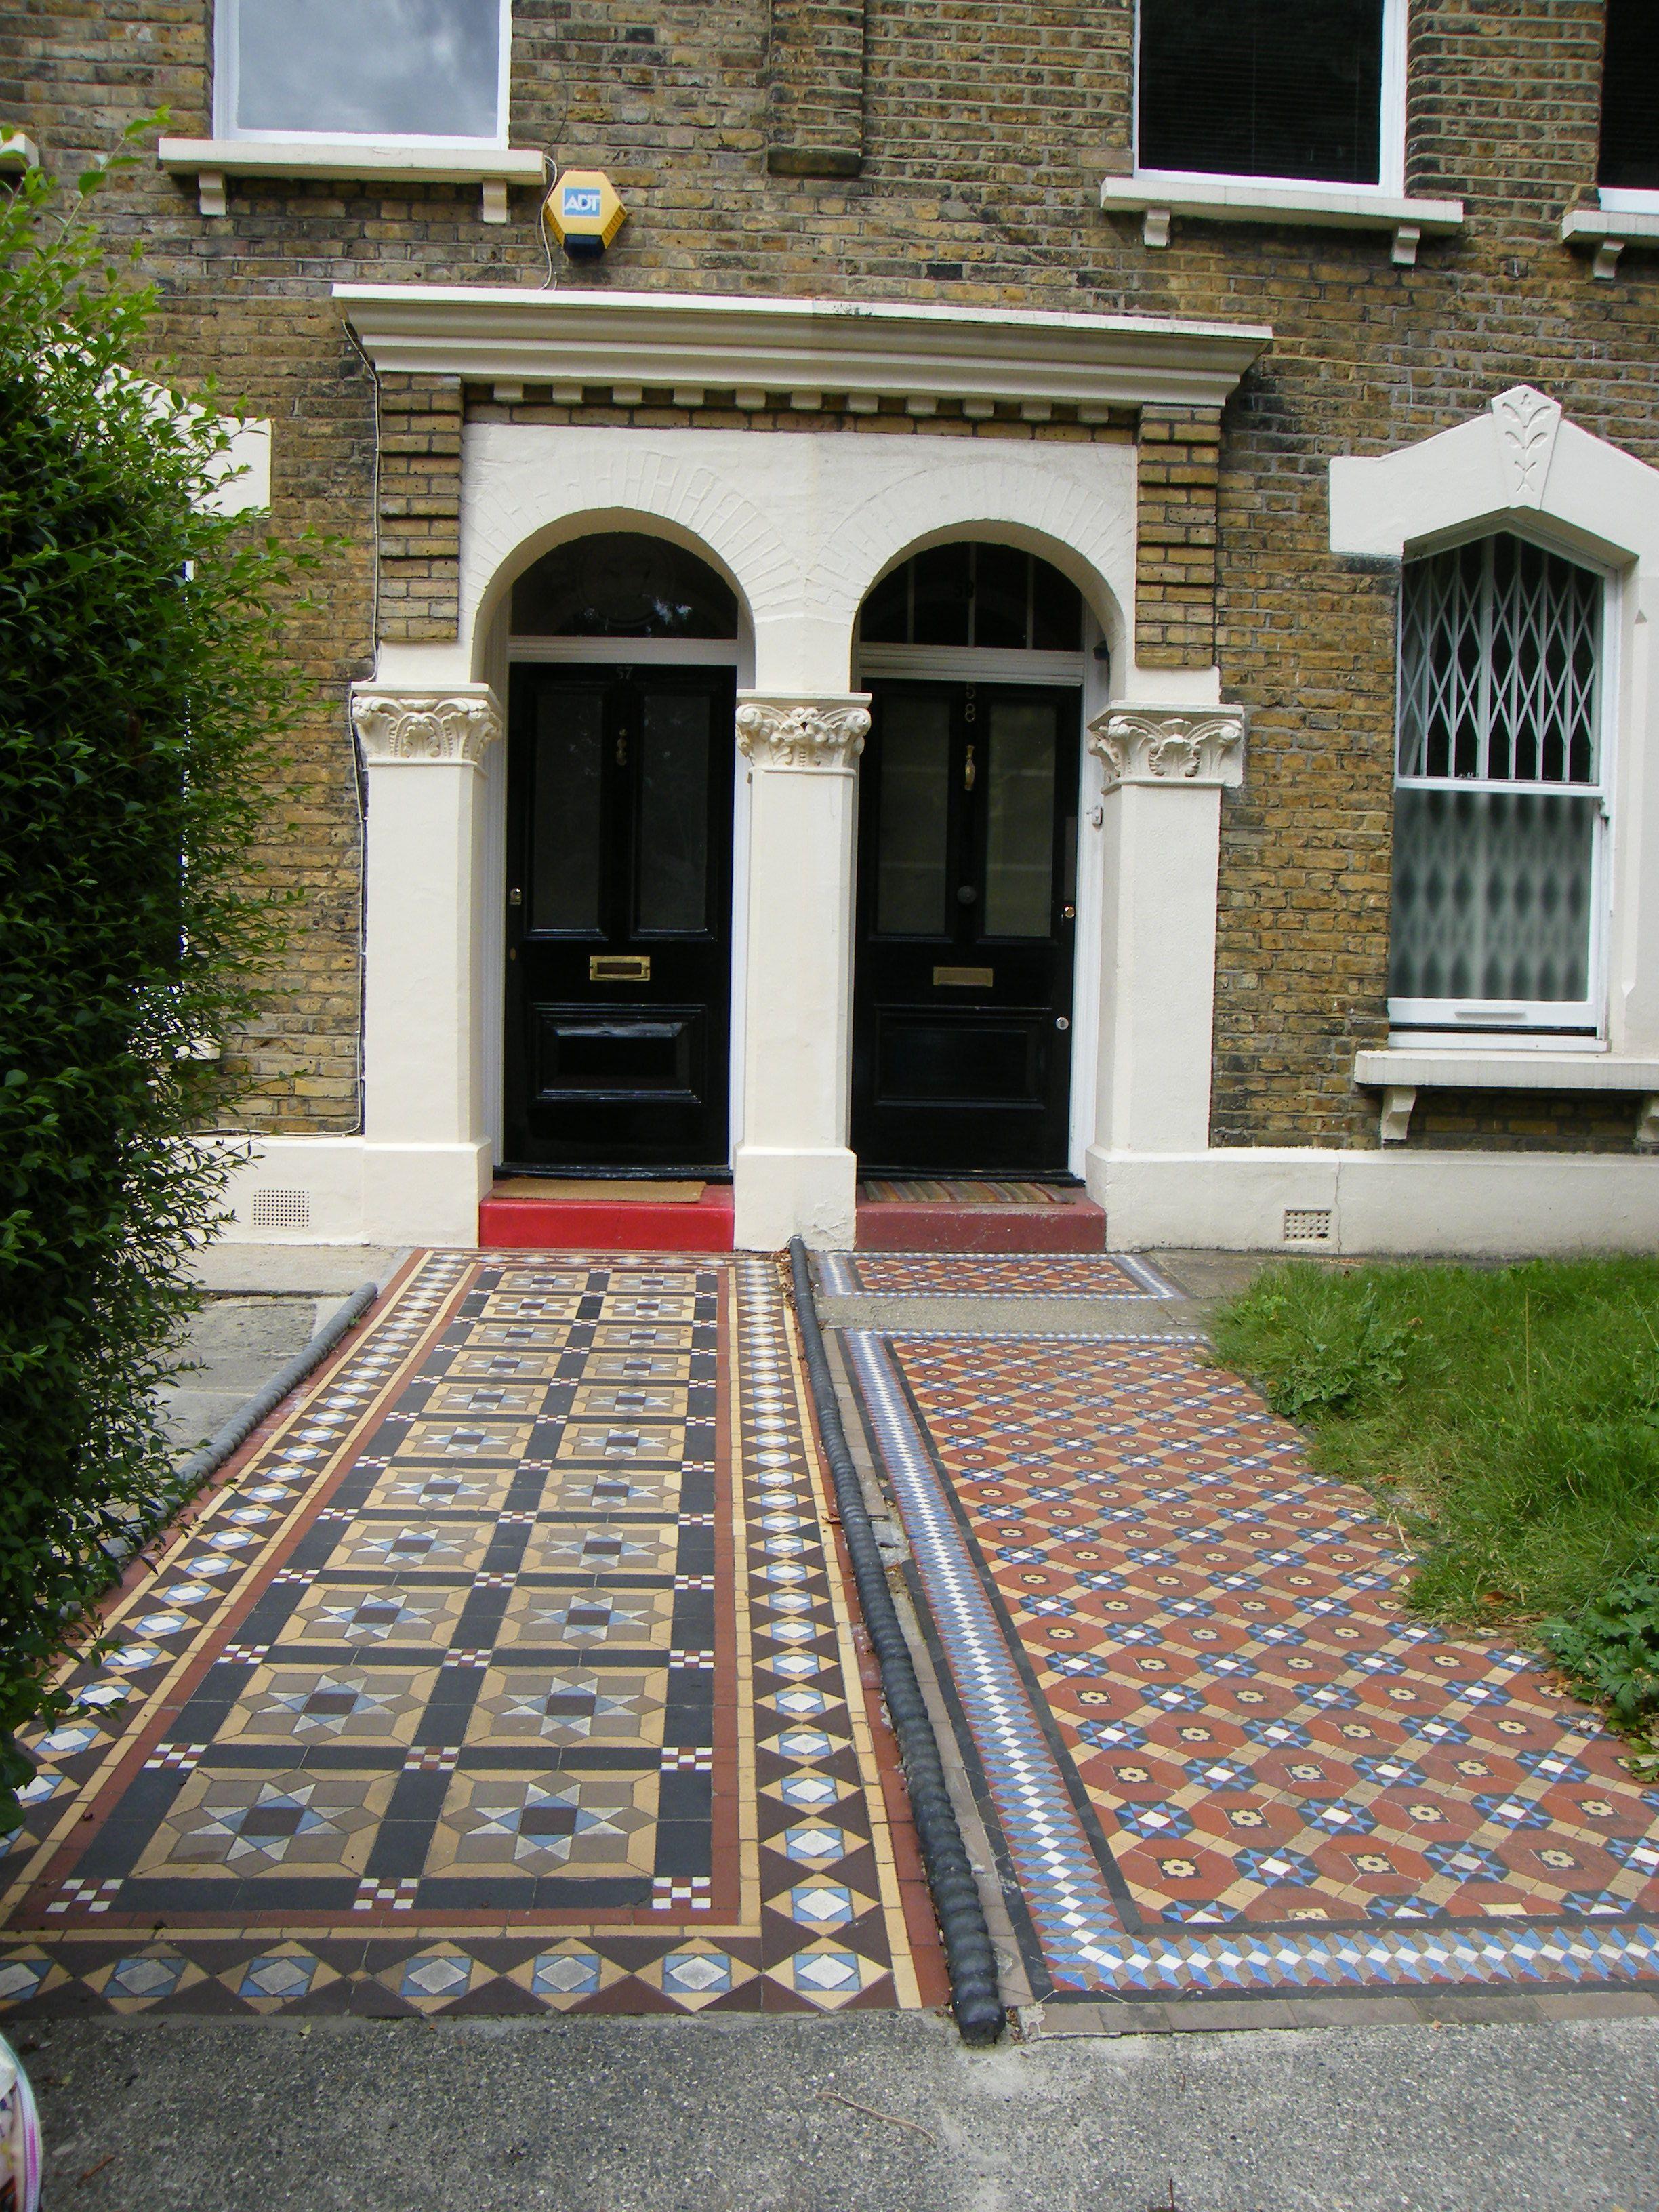 Hackney London Floor Mosiac Picture Made By Marielle Beemer Natural Flooring London Park Floor Design